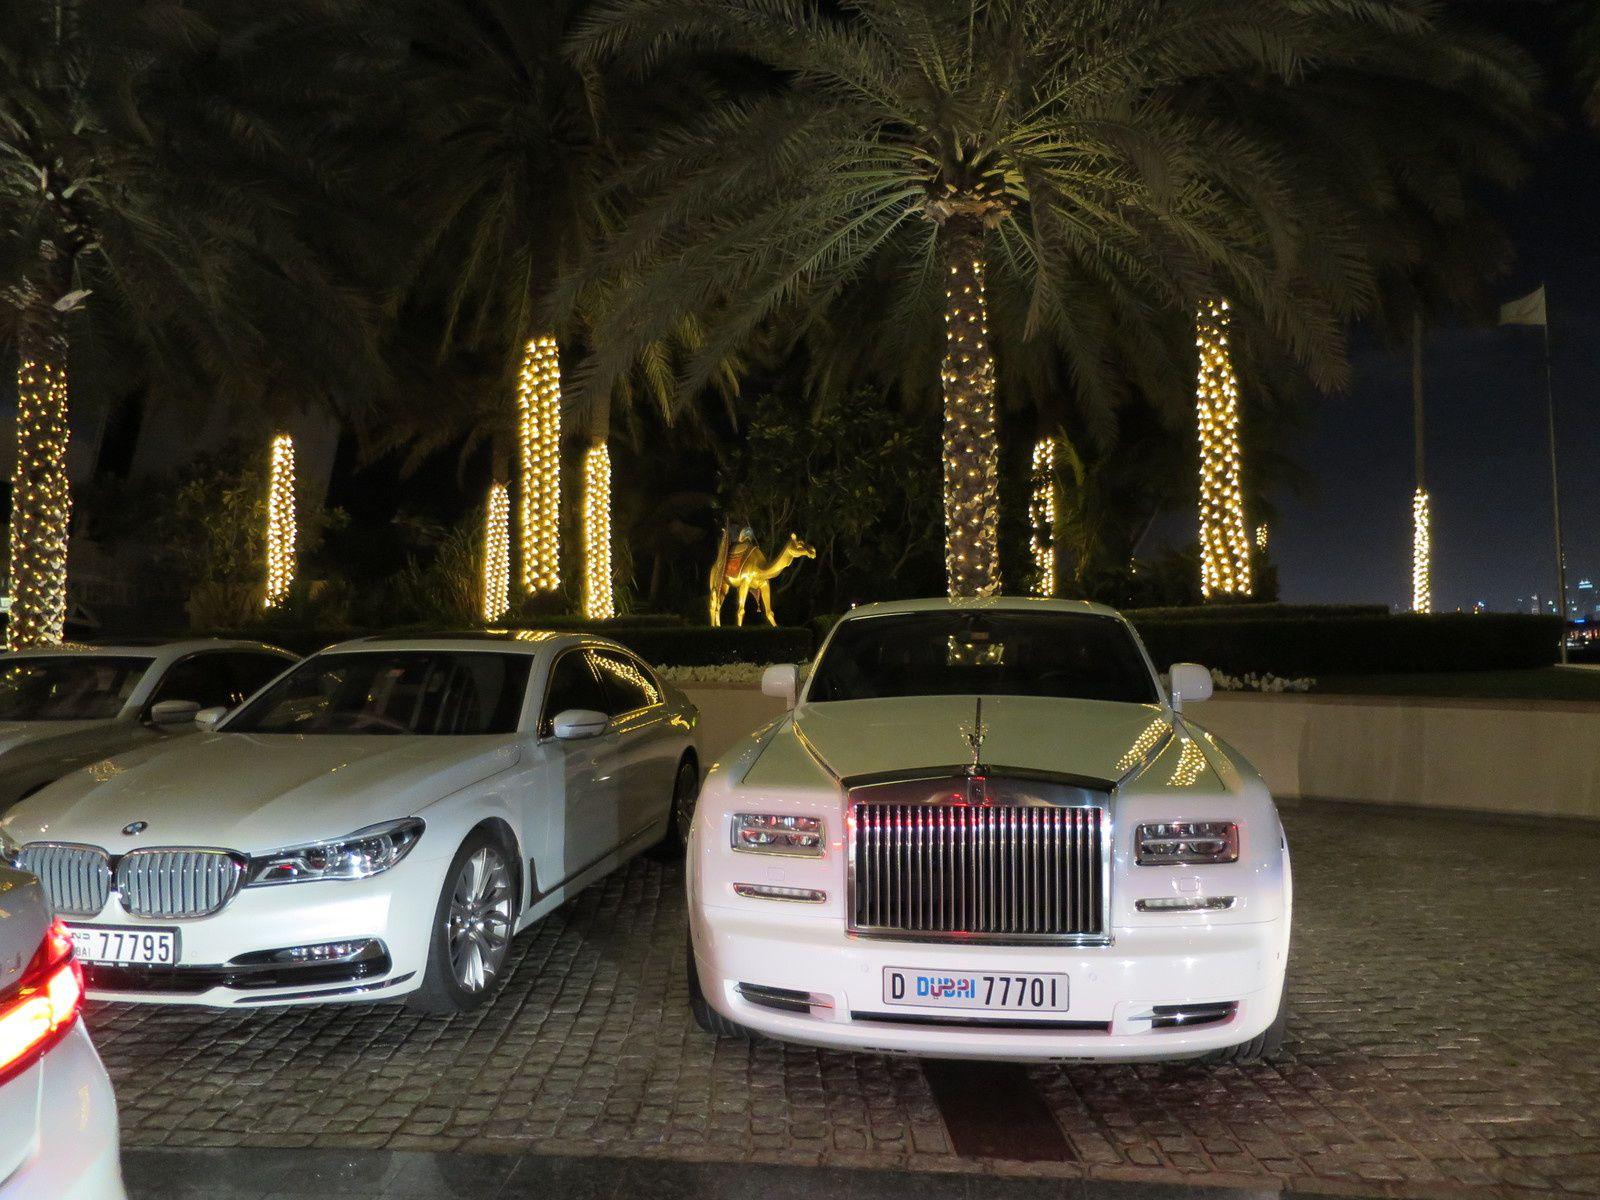 Rolls Royce. Ph. Delahaye.A l'arrière plan, l'hôtel Jumeirah. Ph. Delahaye.